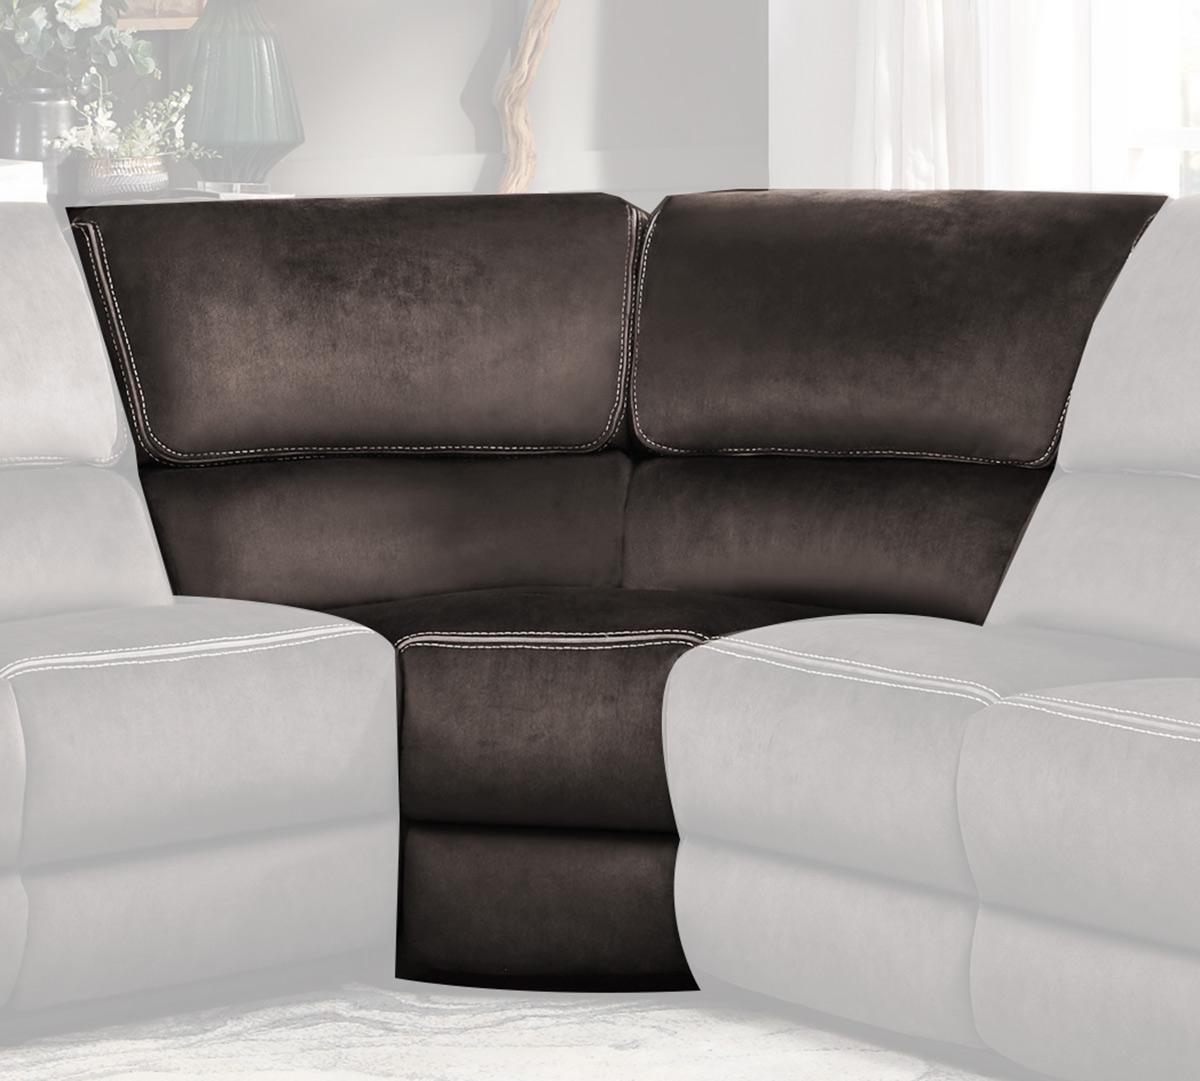 Homelegance Bronagh Corner Seat - Chocolate